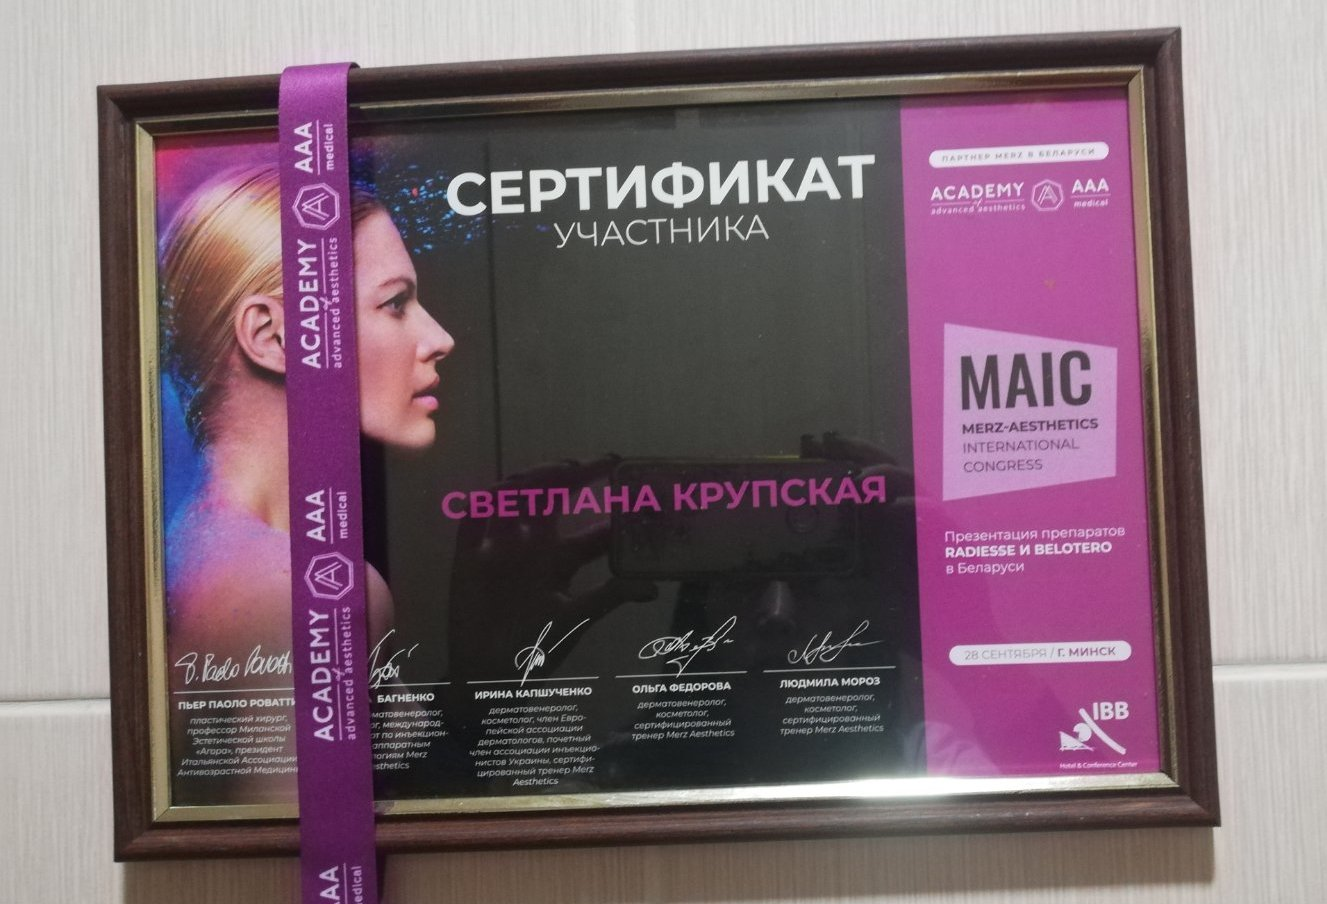 Косметолог Полоцк